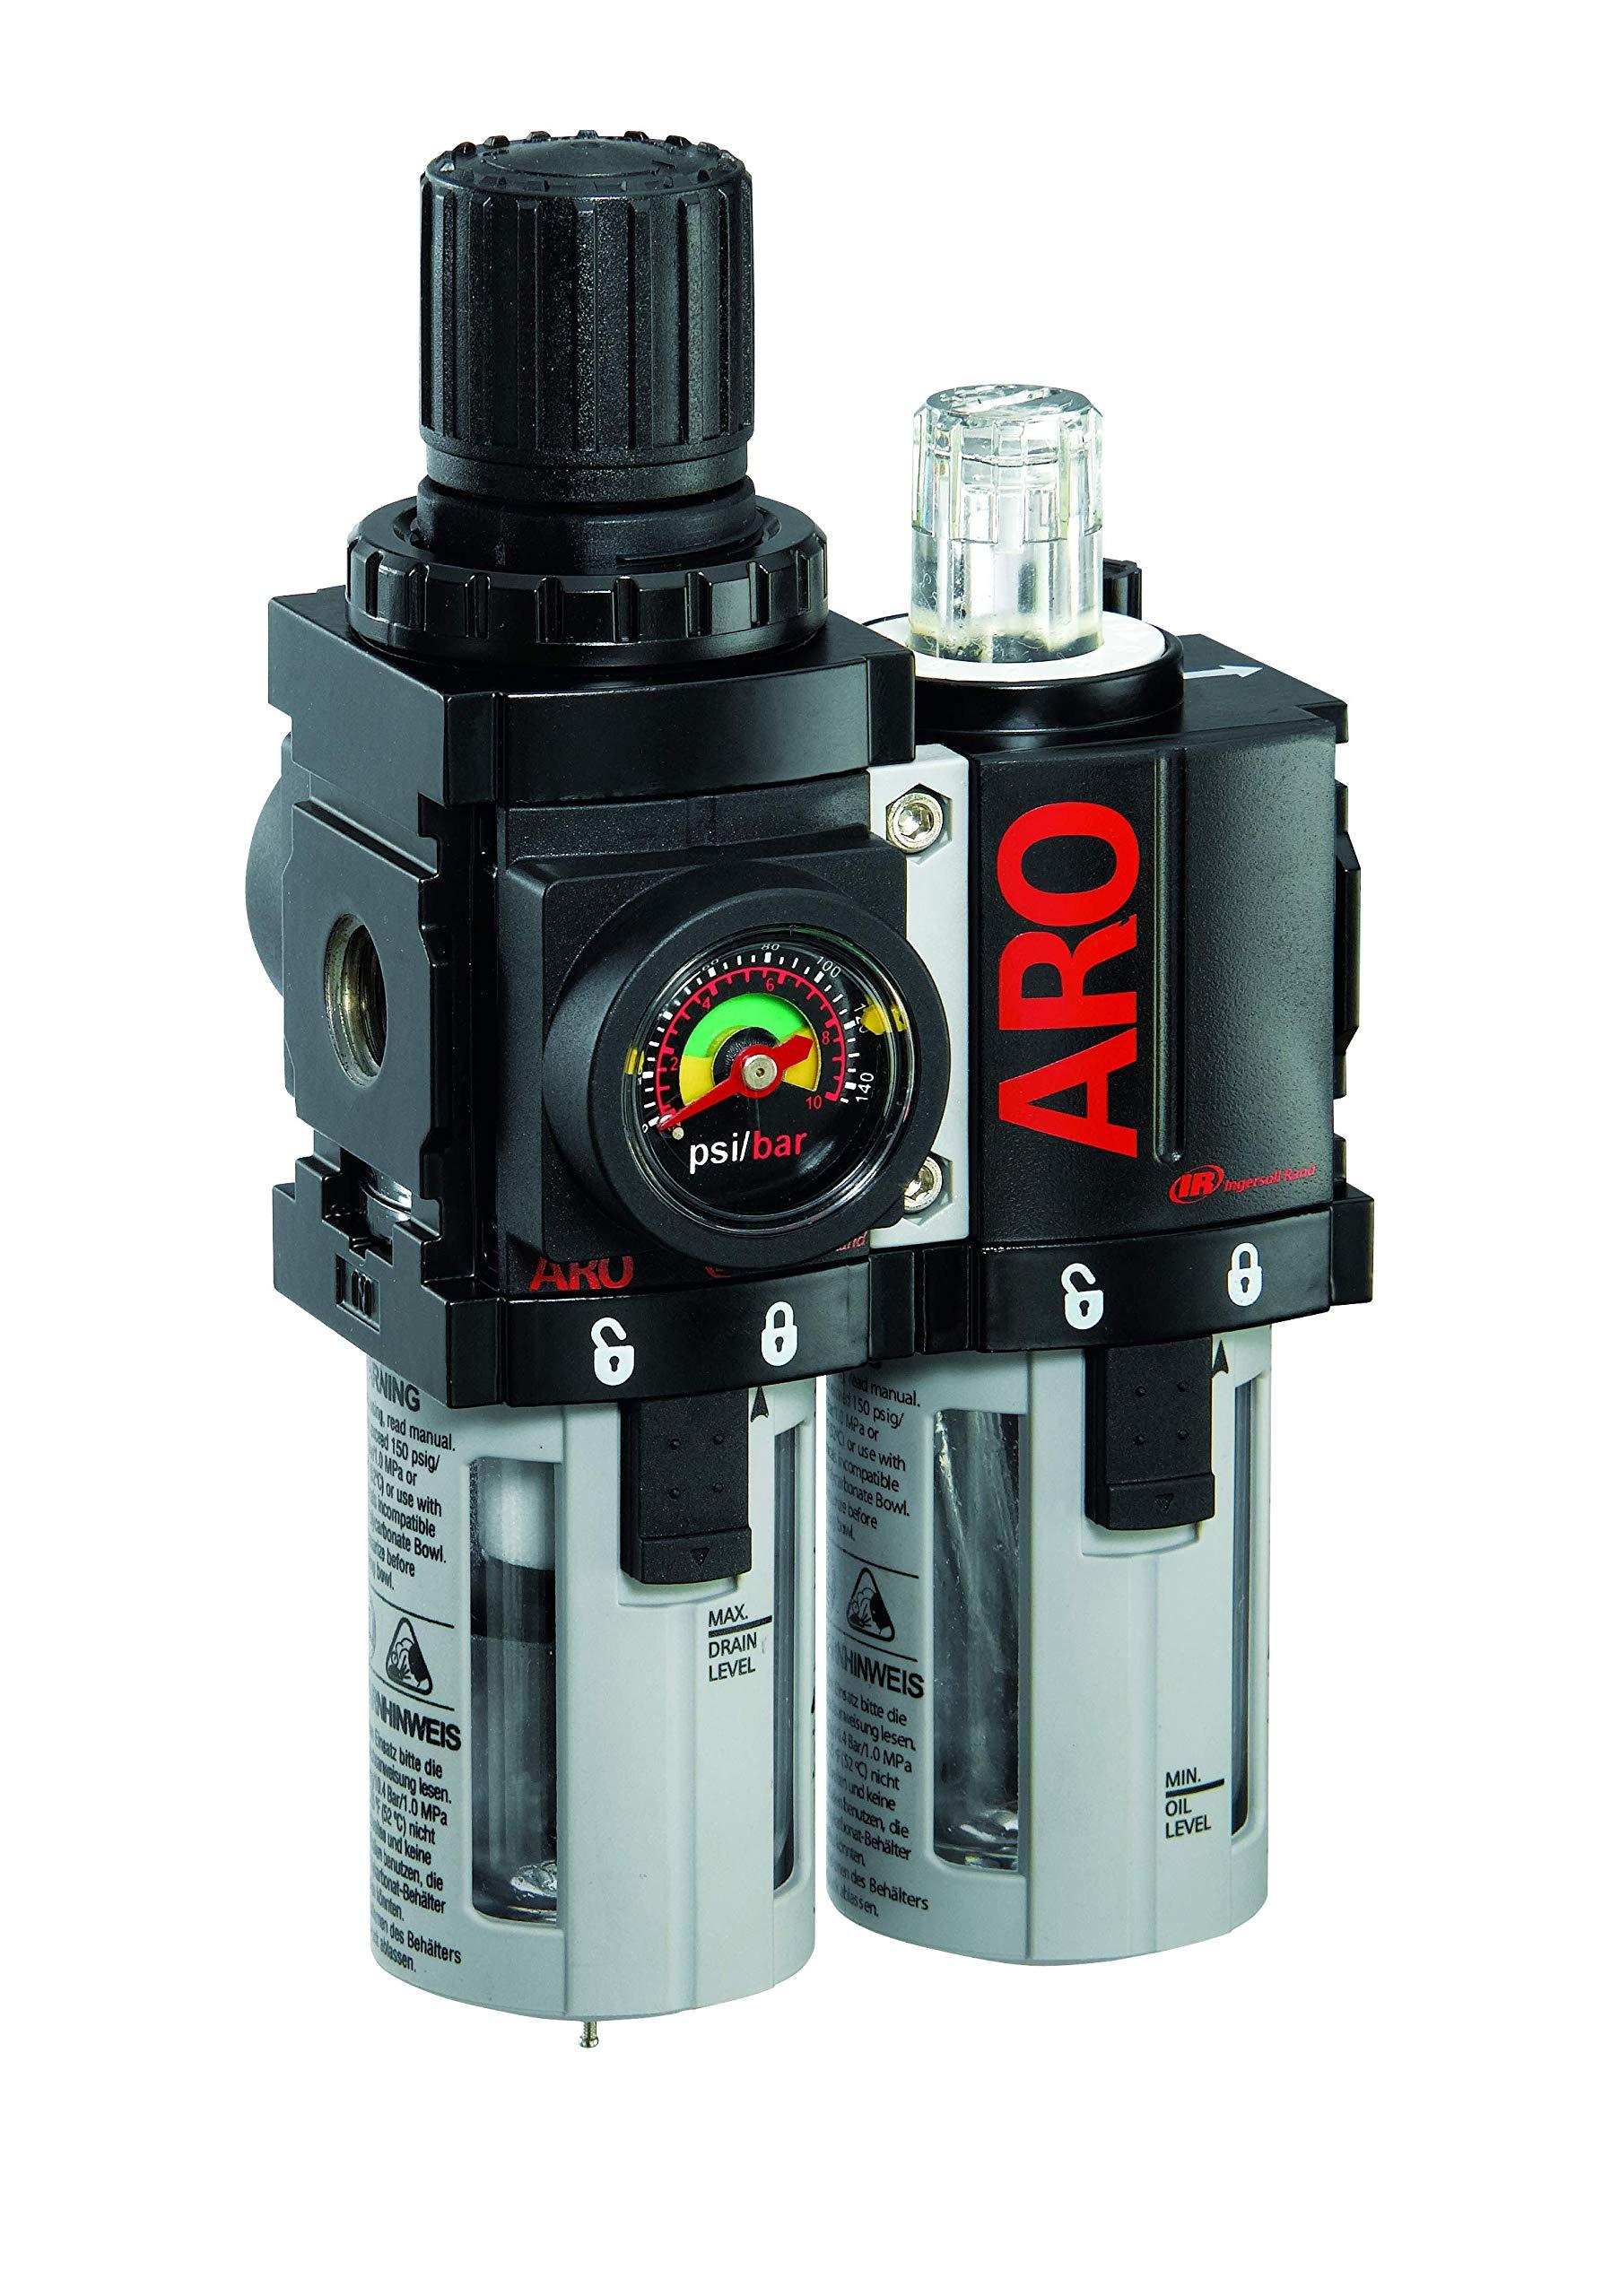 ARO C38121-600-VS Air Filter-Regulator-Lubricator Combination, 1/4'' NPT by Ingersoll Rand